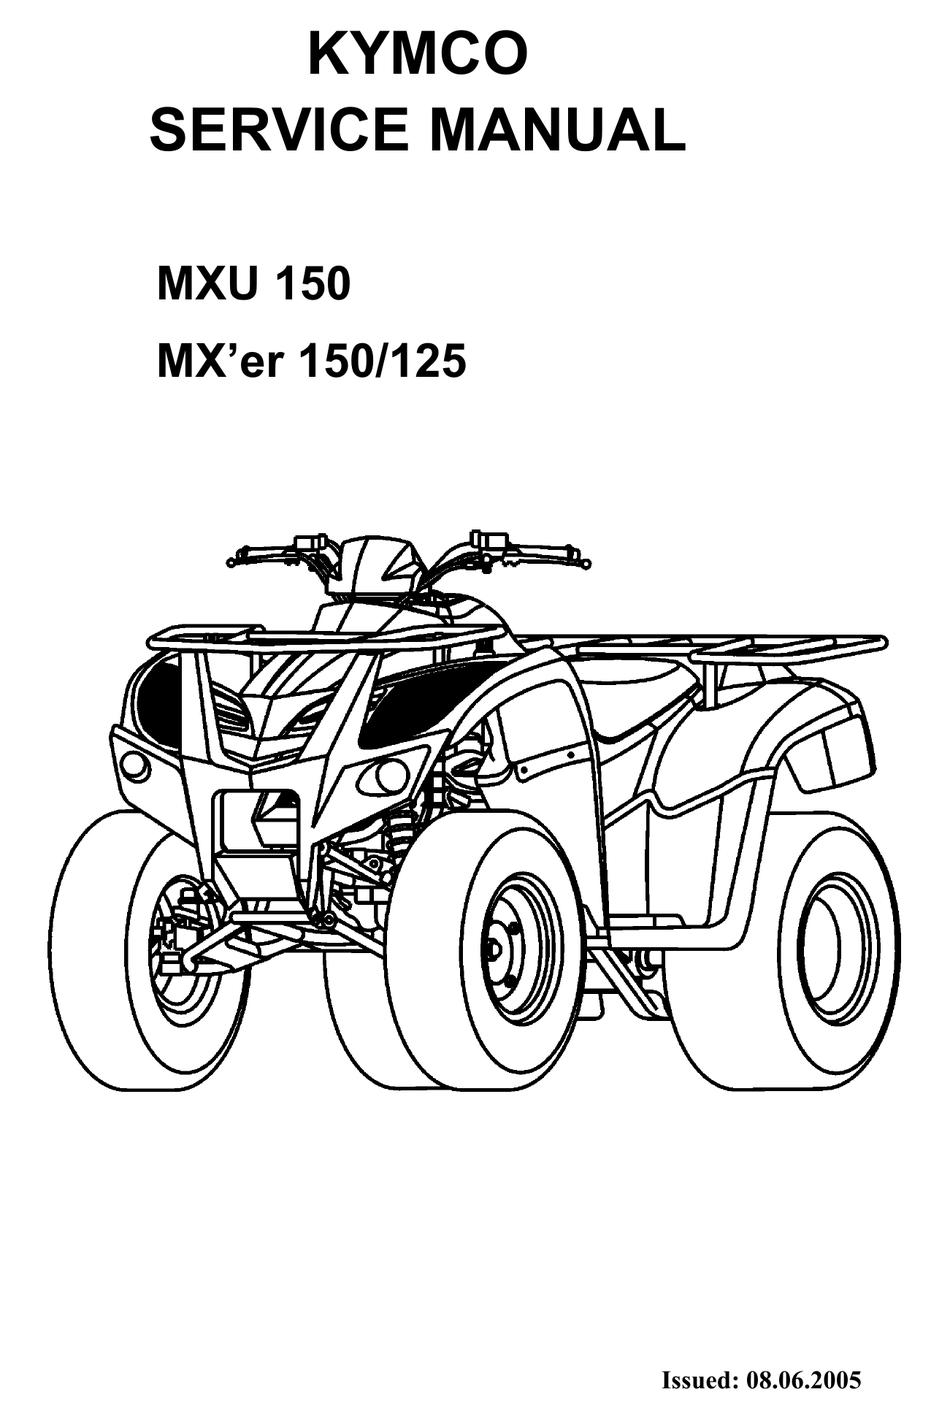 Kymco Mxu 150 Service Manual Pdf Download Manualslib